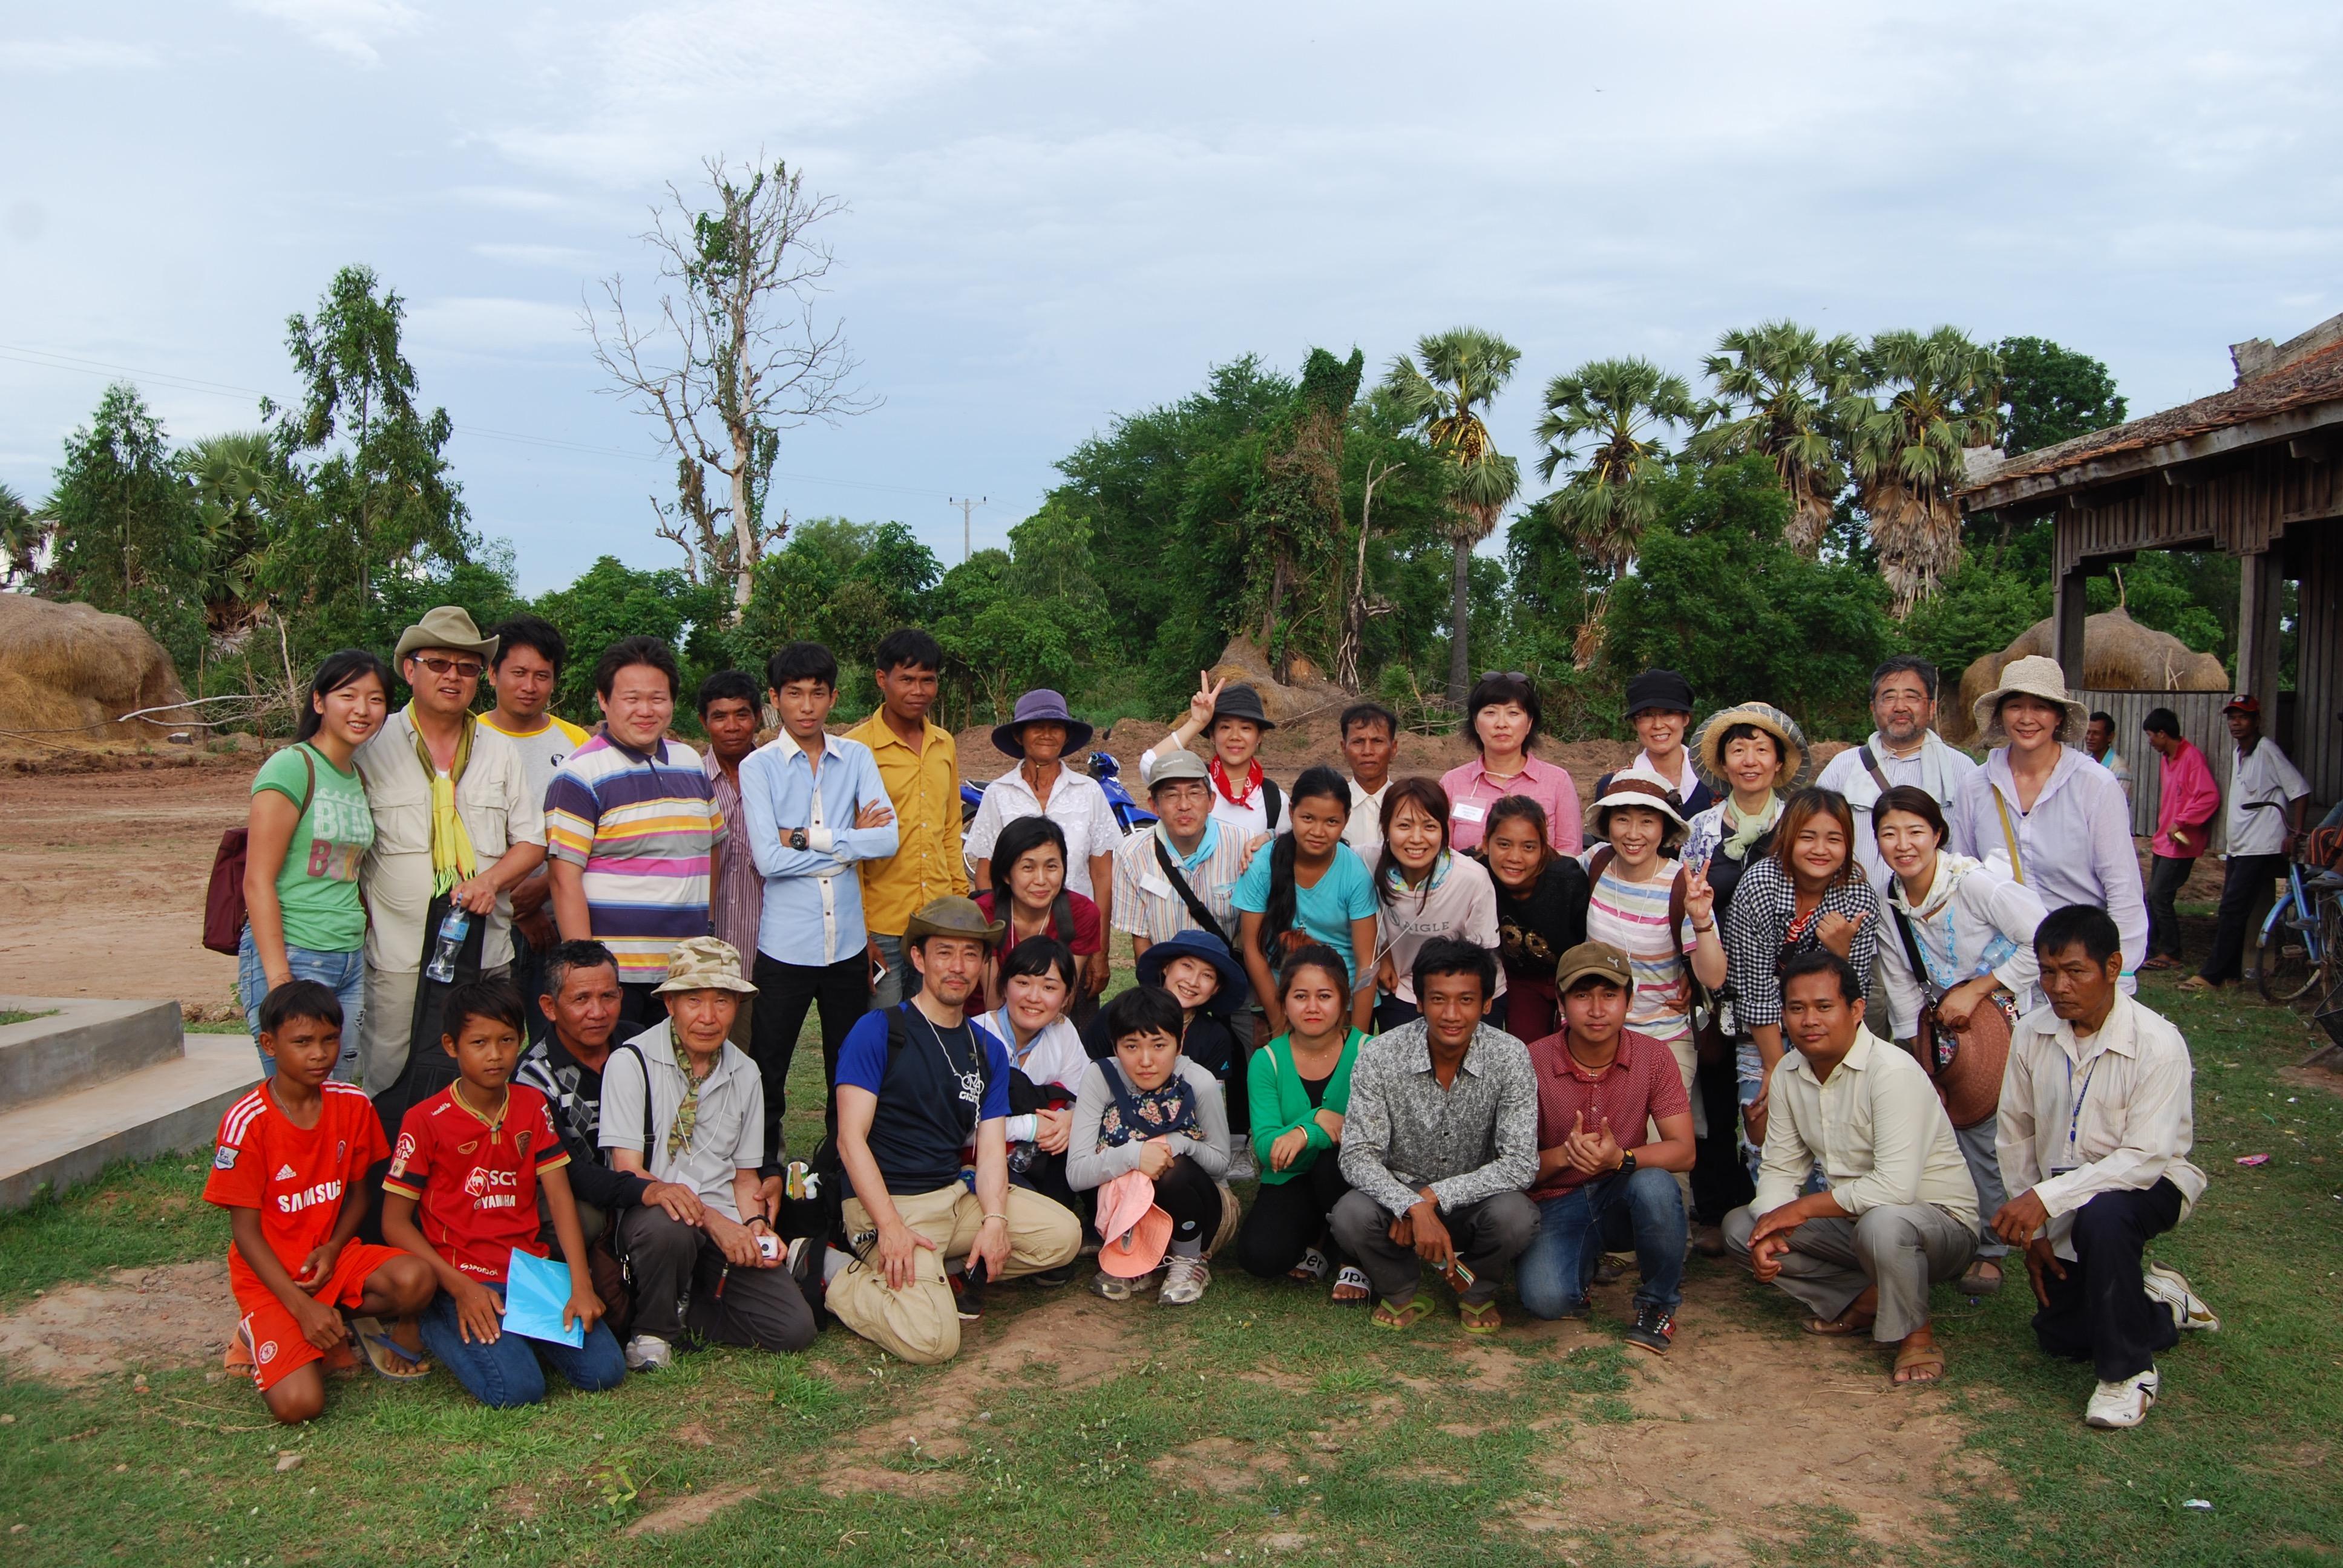 2015 in Cambodia